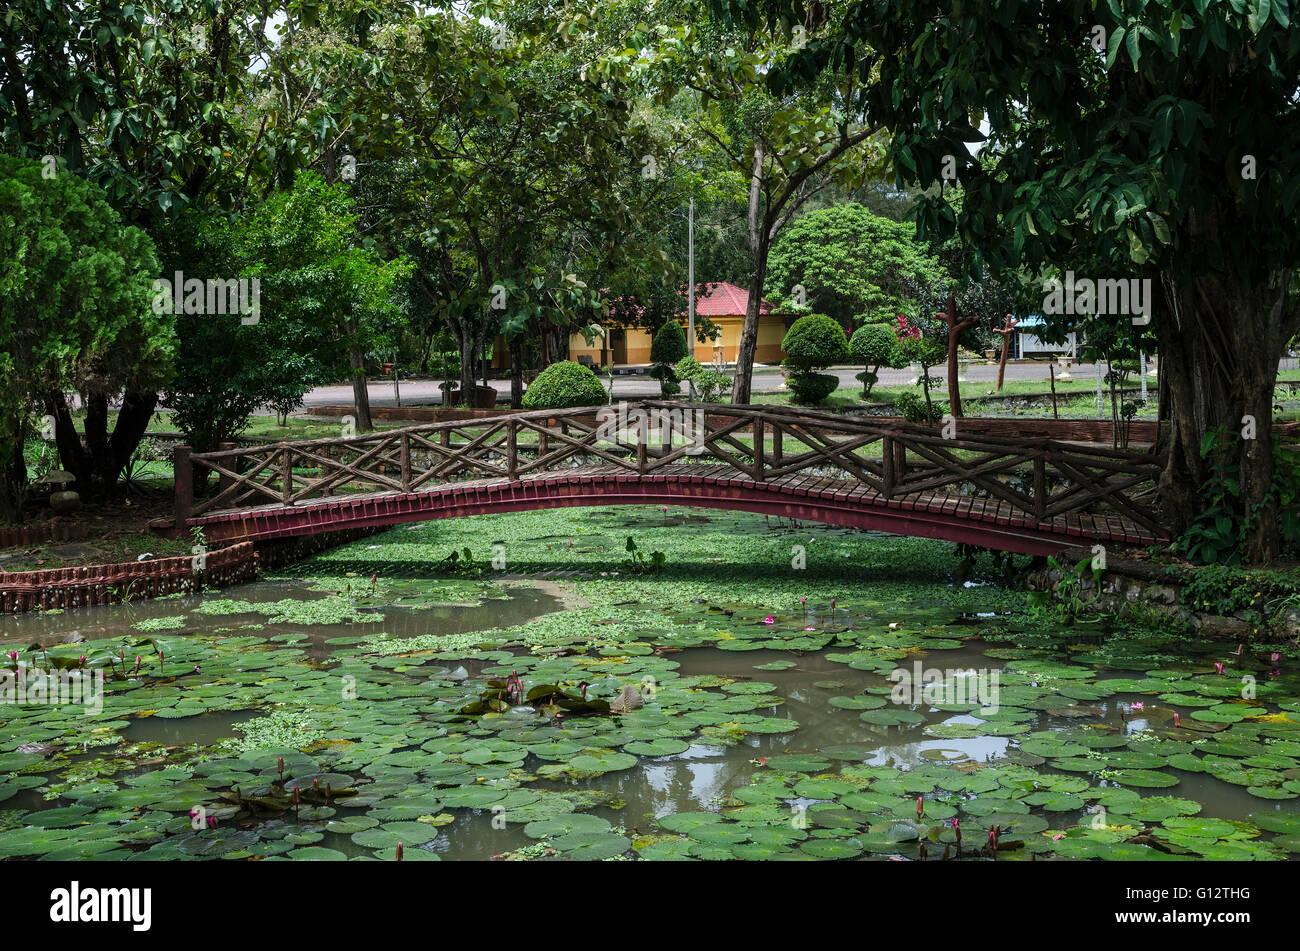 Taman Rekreasi Tasik Melati, Perlis, Malaysia. Tasik Melati is a wetland  famous for its lakes and its recreational - Stock Image